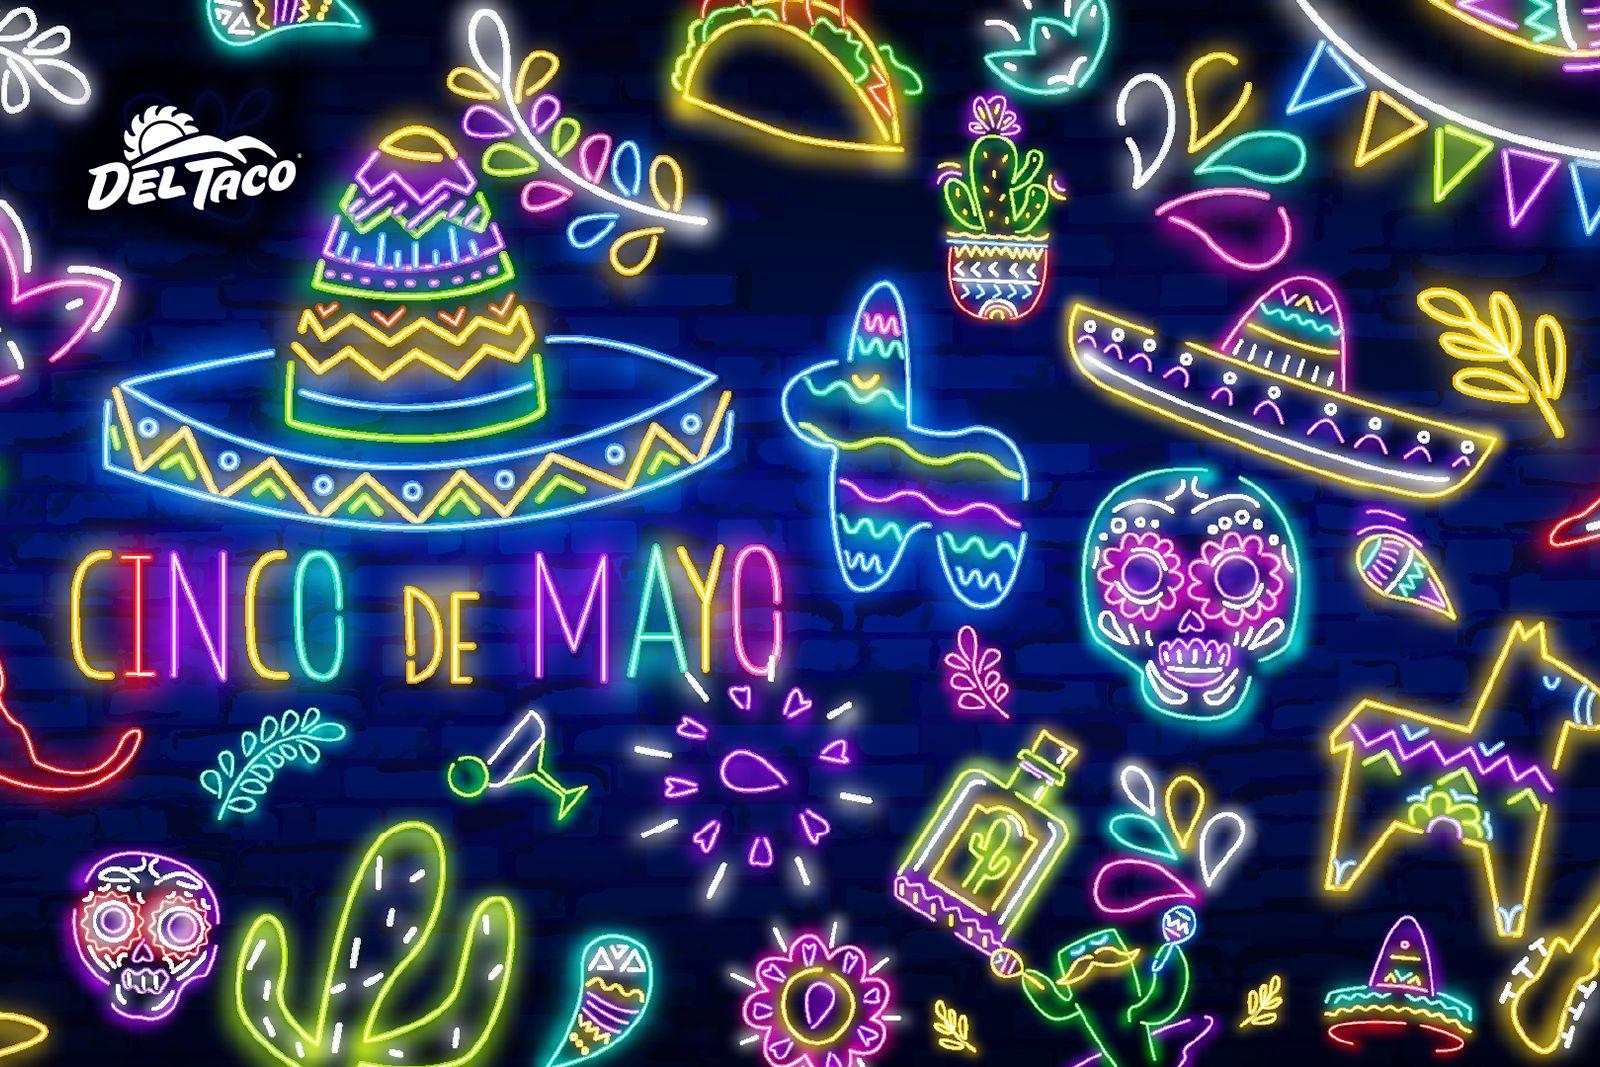 Celebrate Cinco de Mayo Del Taco Style